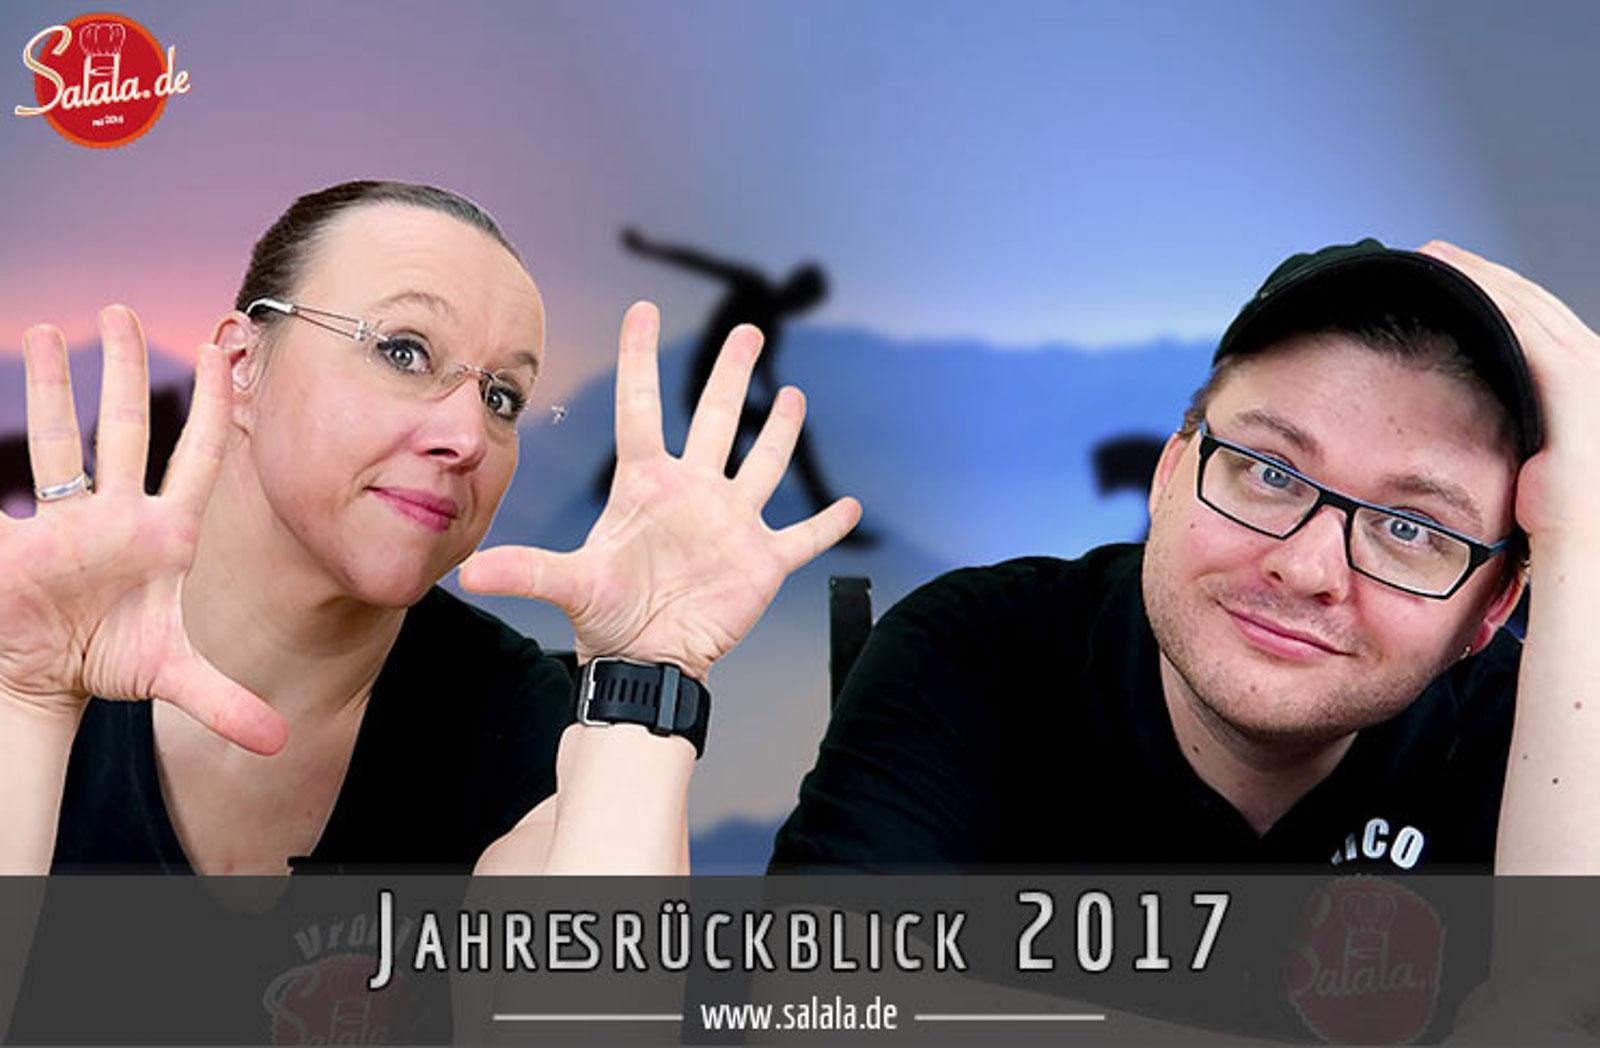 Top 10 2017 - salalas Jahresrückblick 2017 - Happ New Year